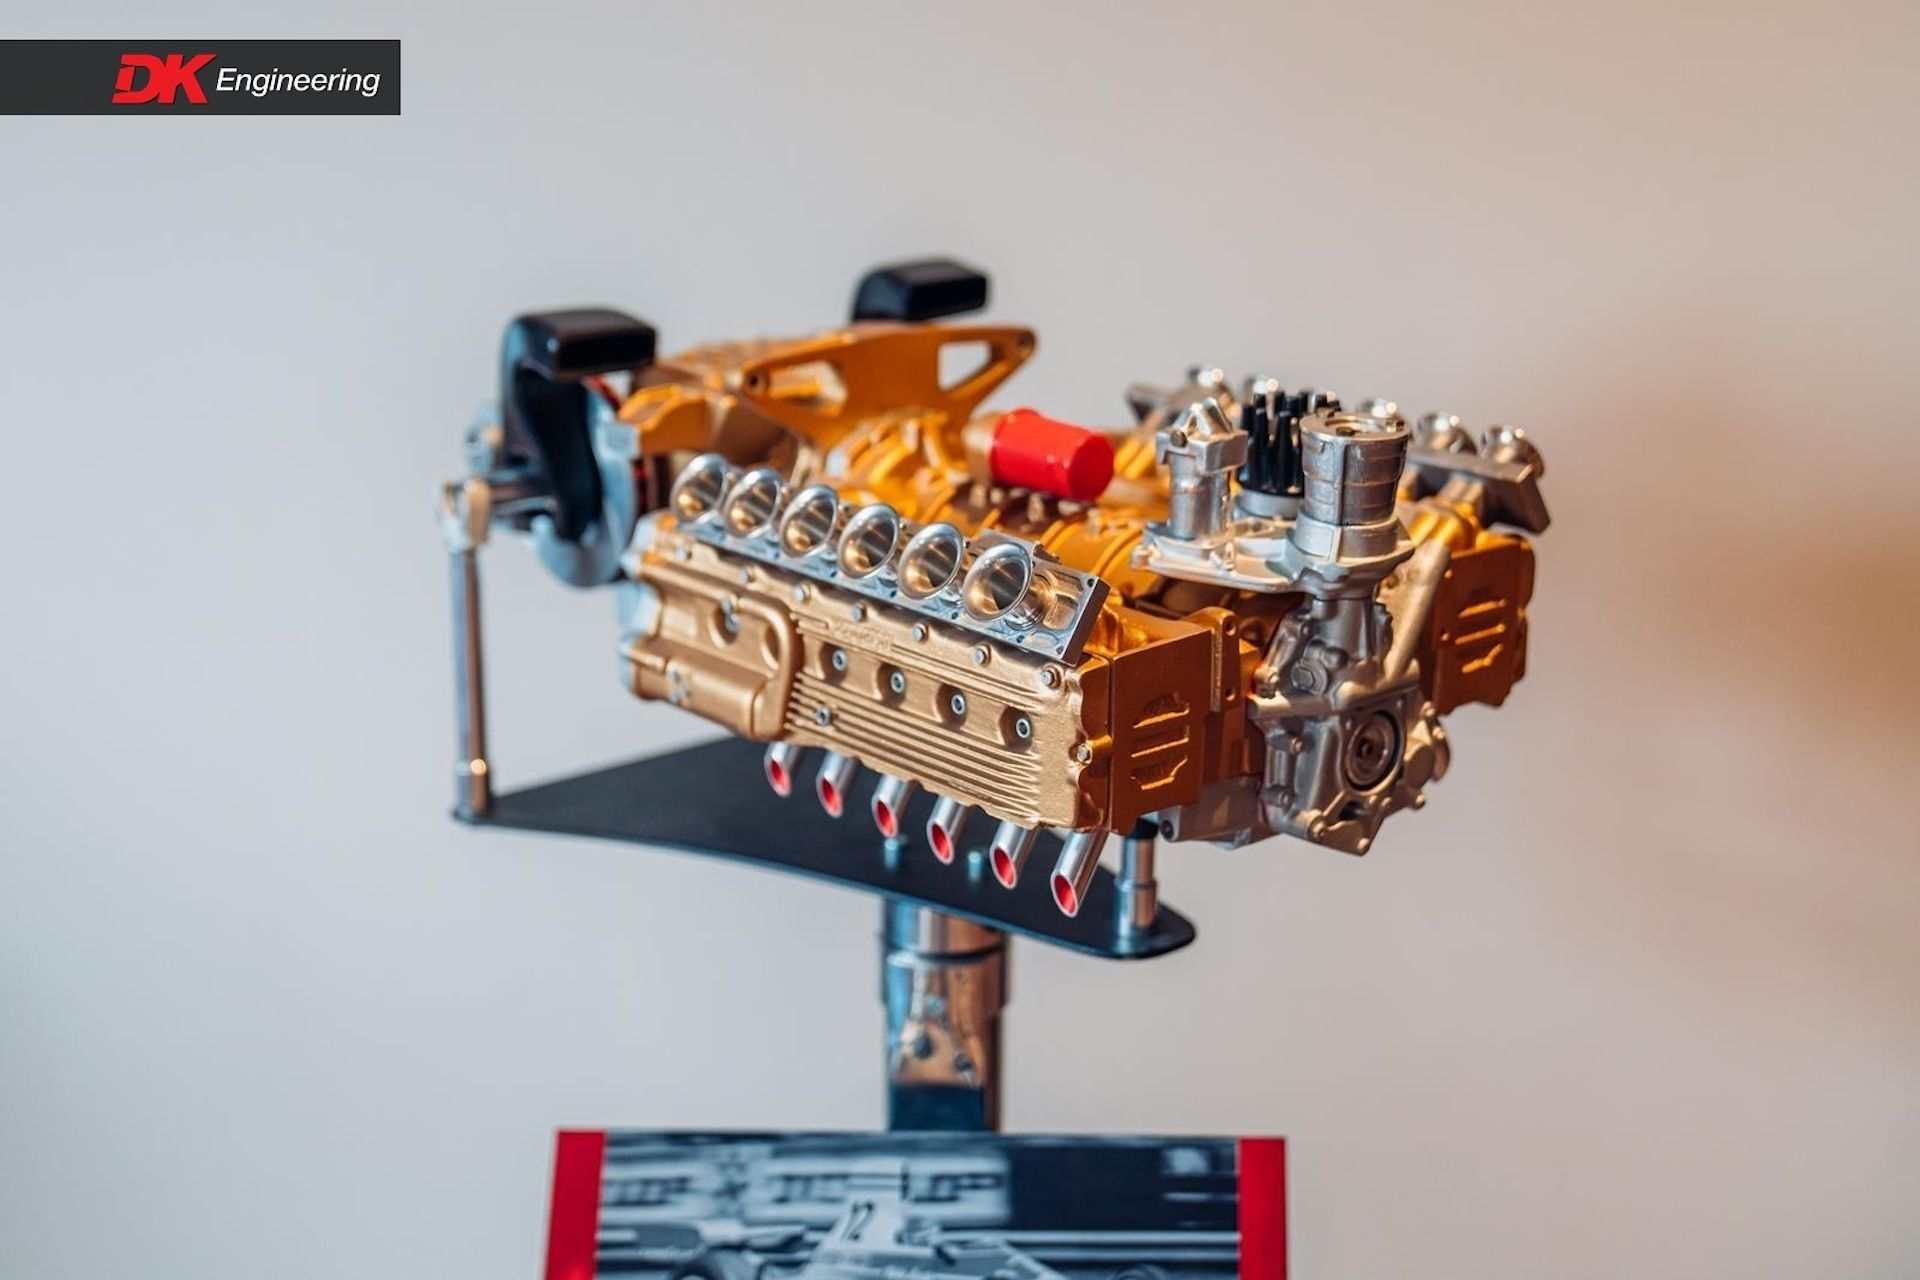 Terzo-Dalia-Ferrari-engines-22